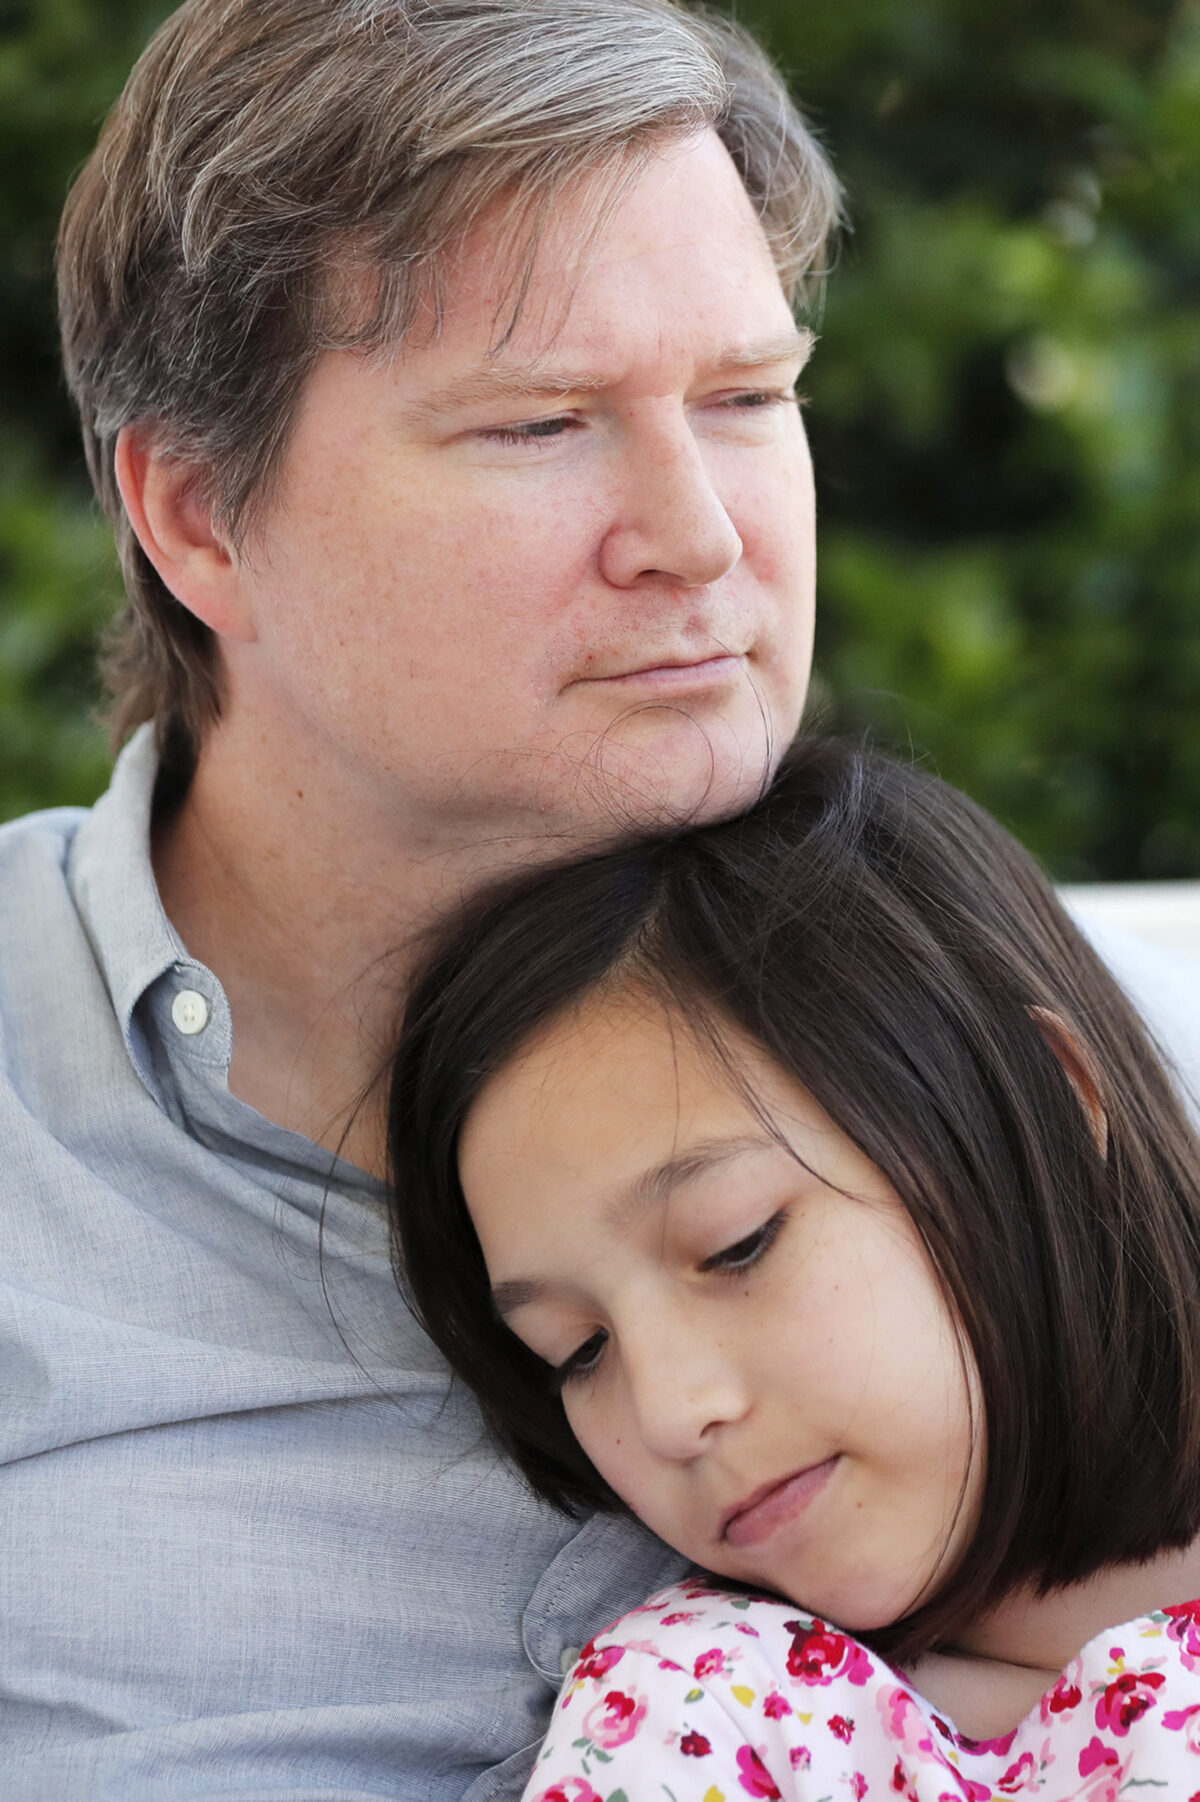 Julit Daly Child Survive CCP virus